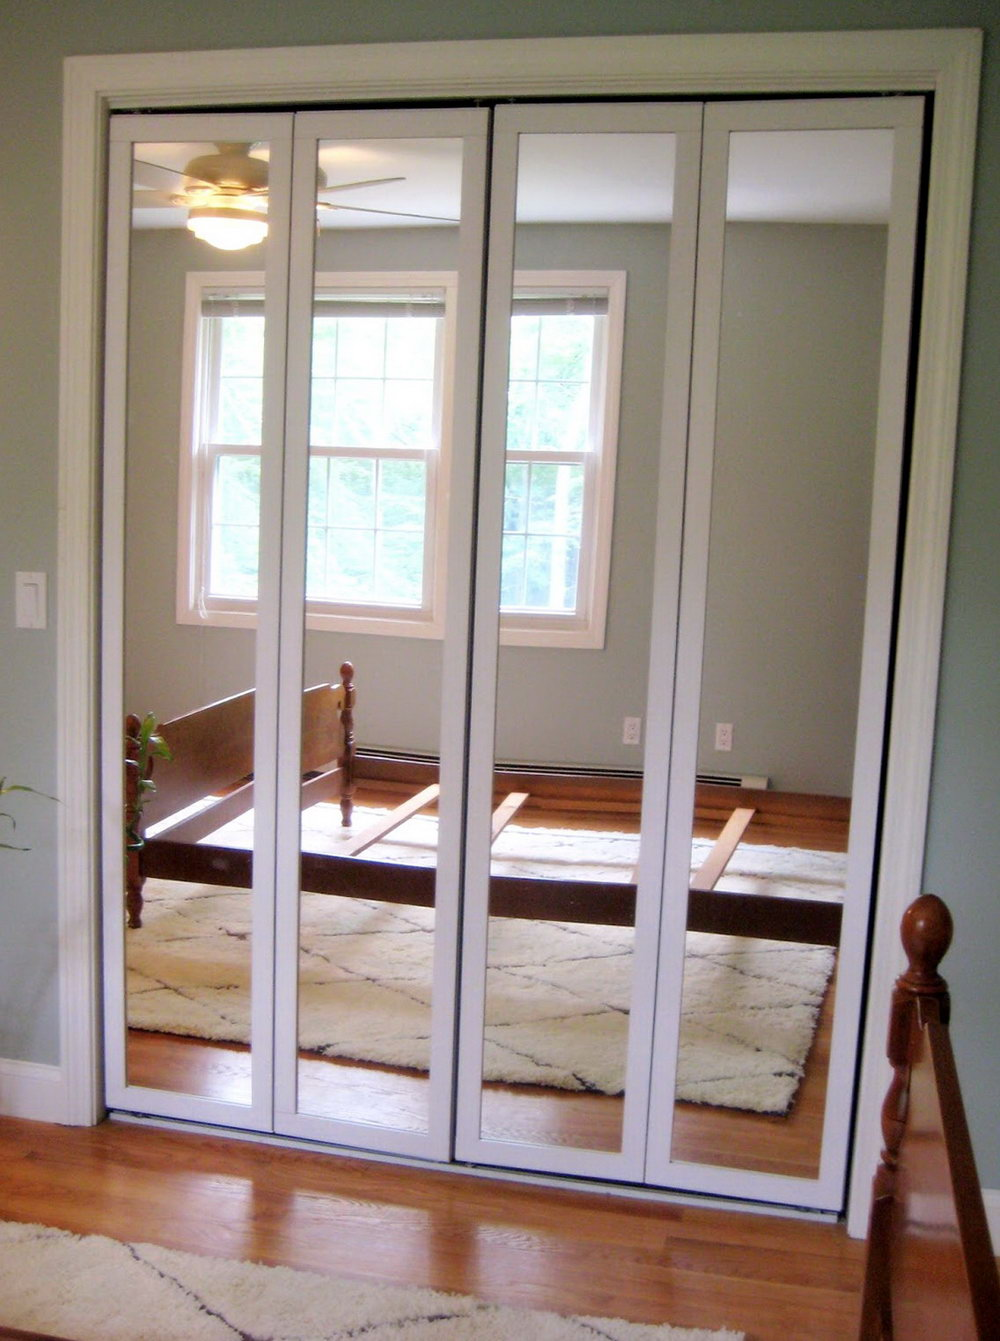 Mirrored Closet Doors Menards A Simple Upgrade To Any